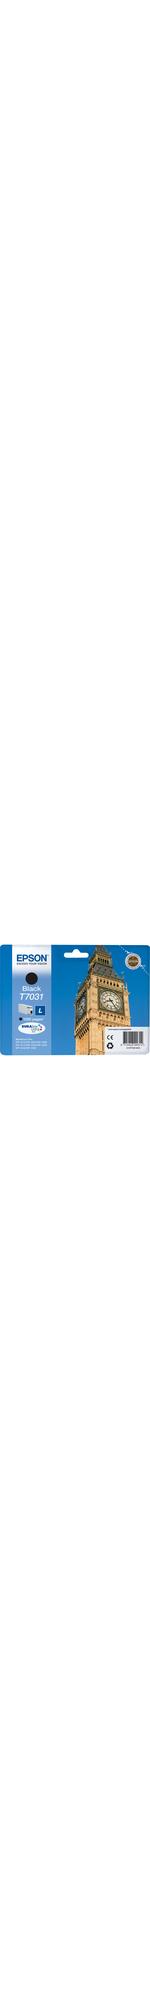 Epson DURABrite Ultra C13T70314010 Ink Cartridge - Black